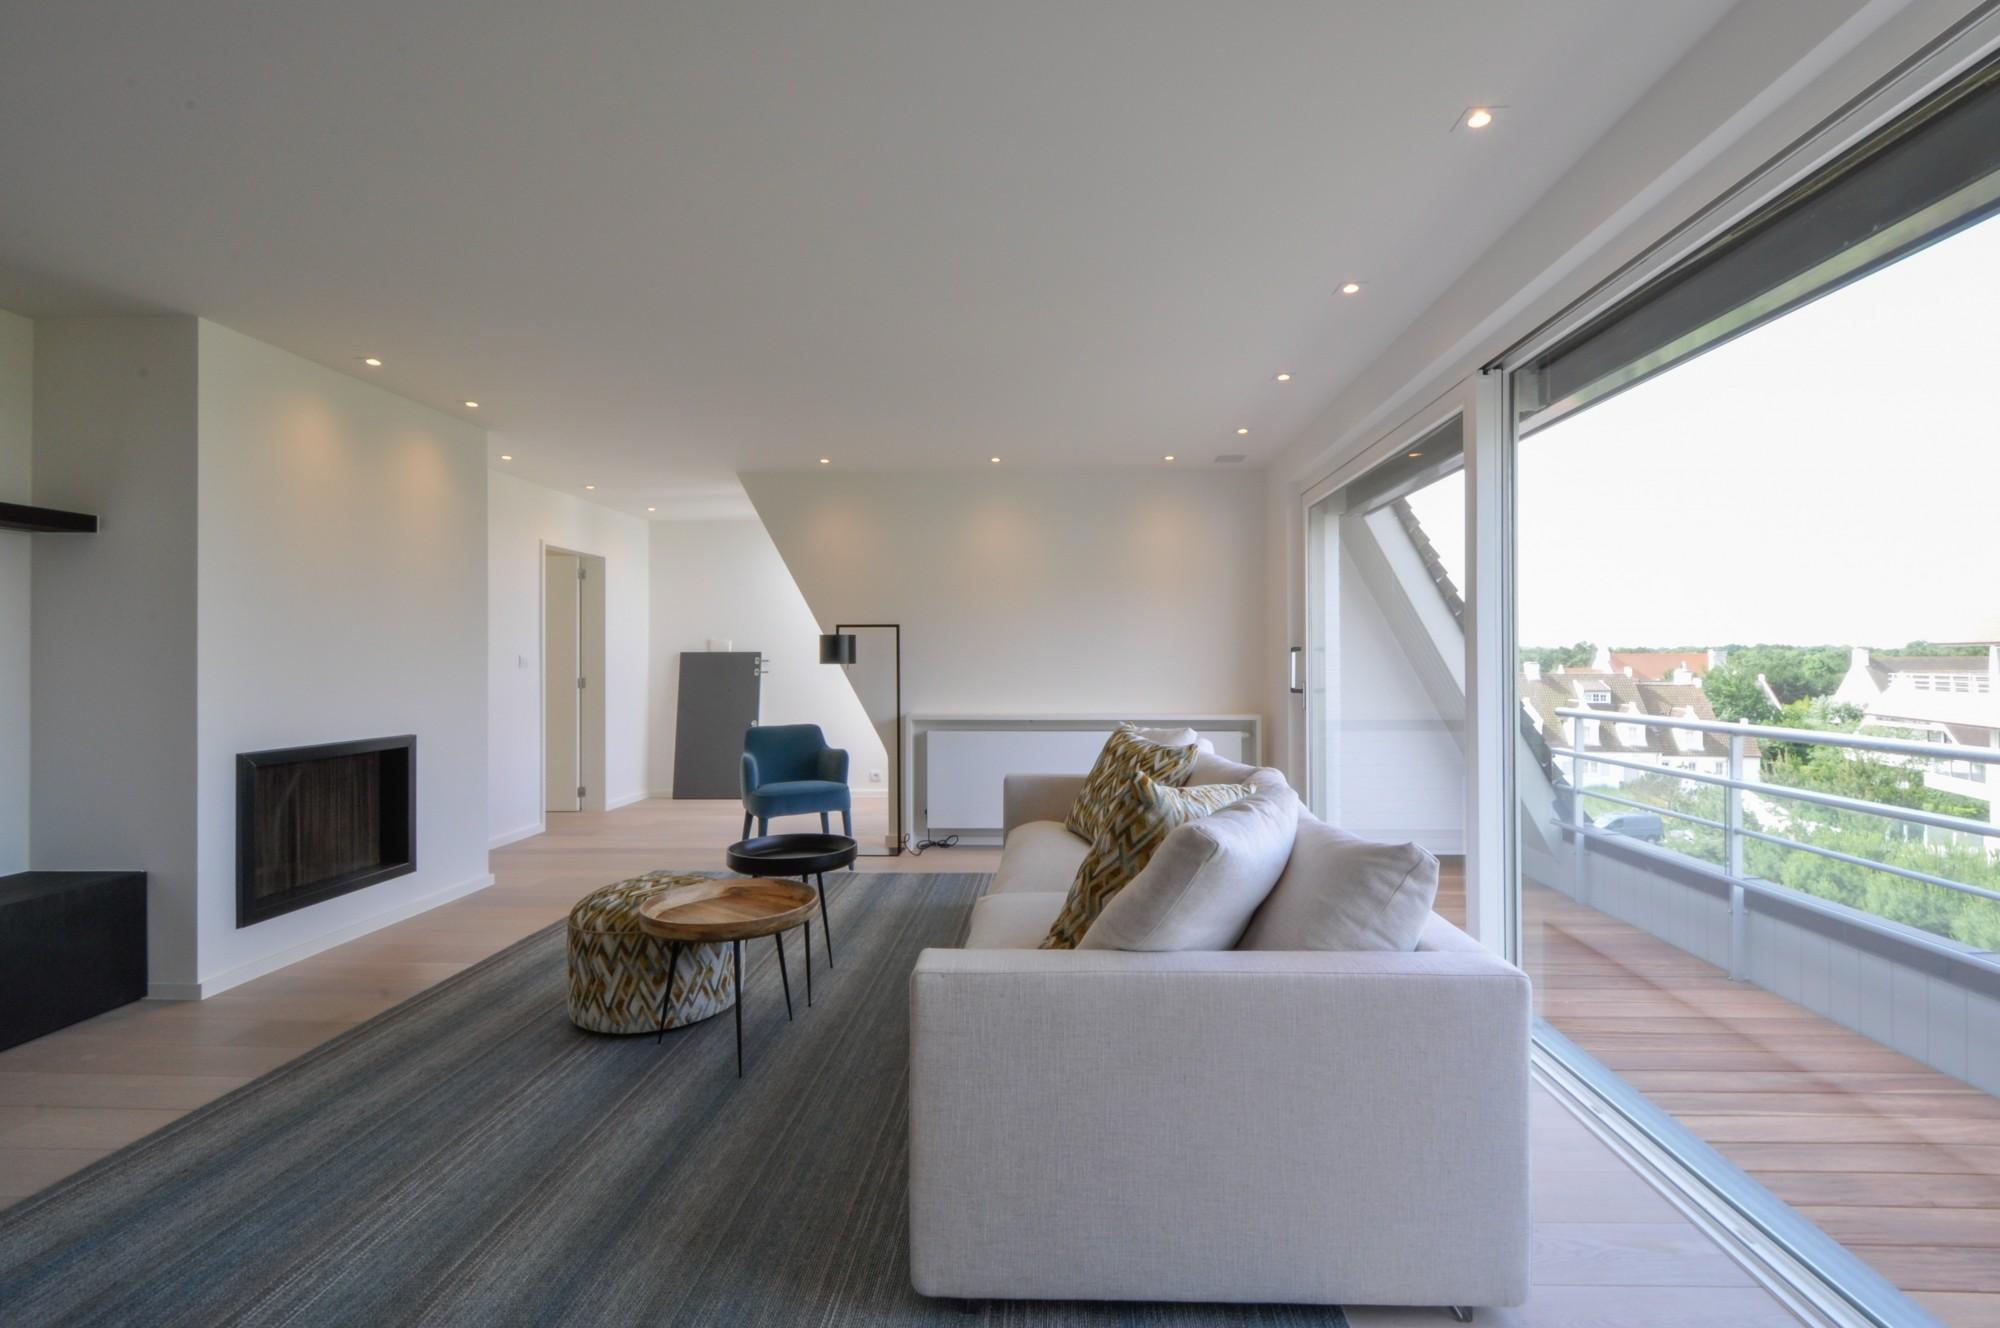 Vente Villa De Luxe Avec Piscine Digue De Mer Knokke Christophe